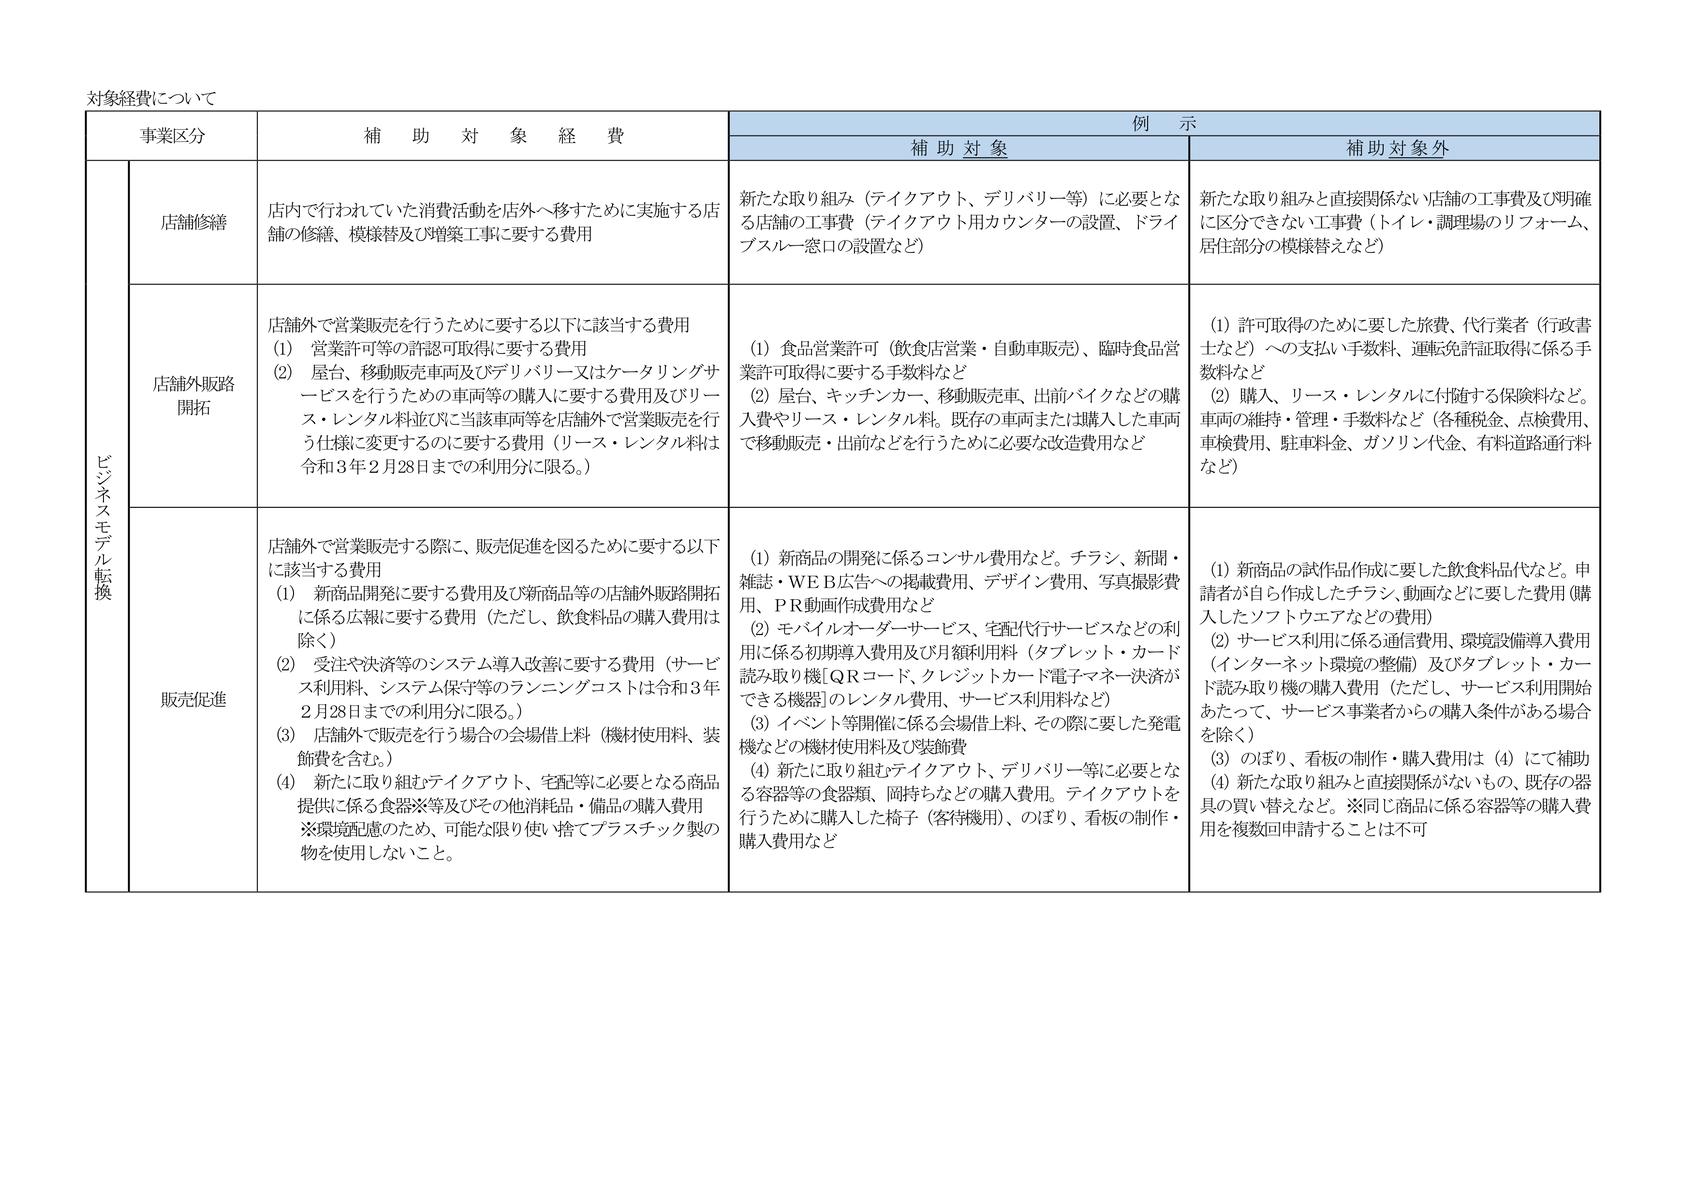 200503_taisyoukeihi1_01